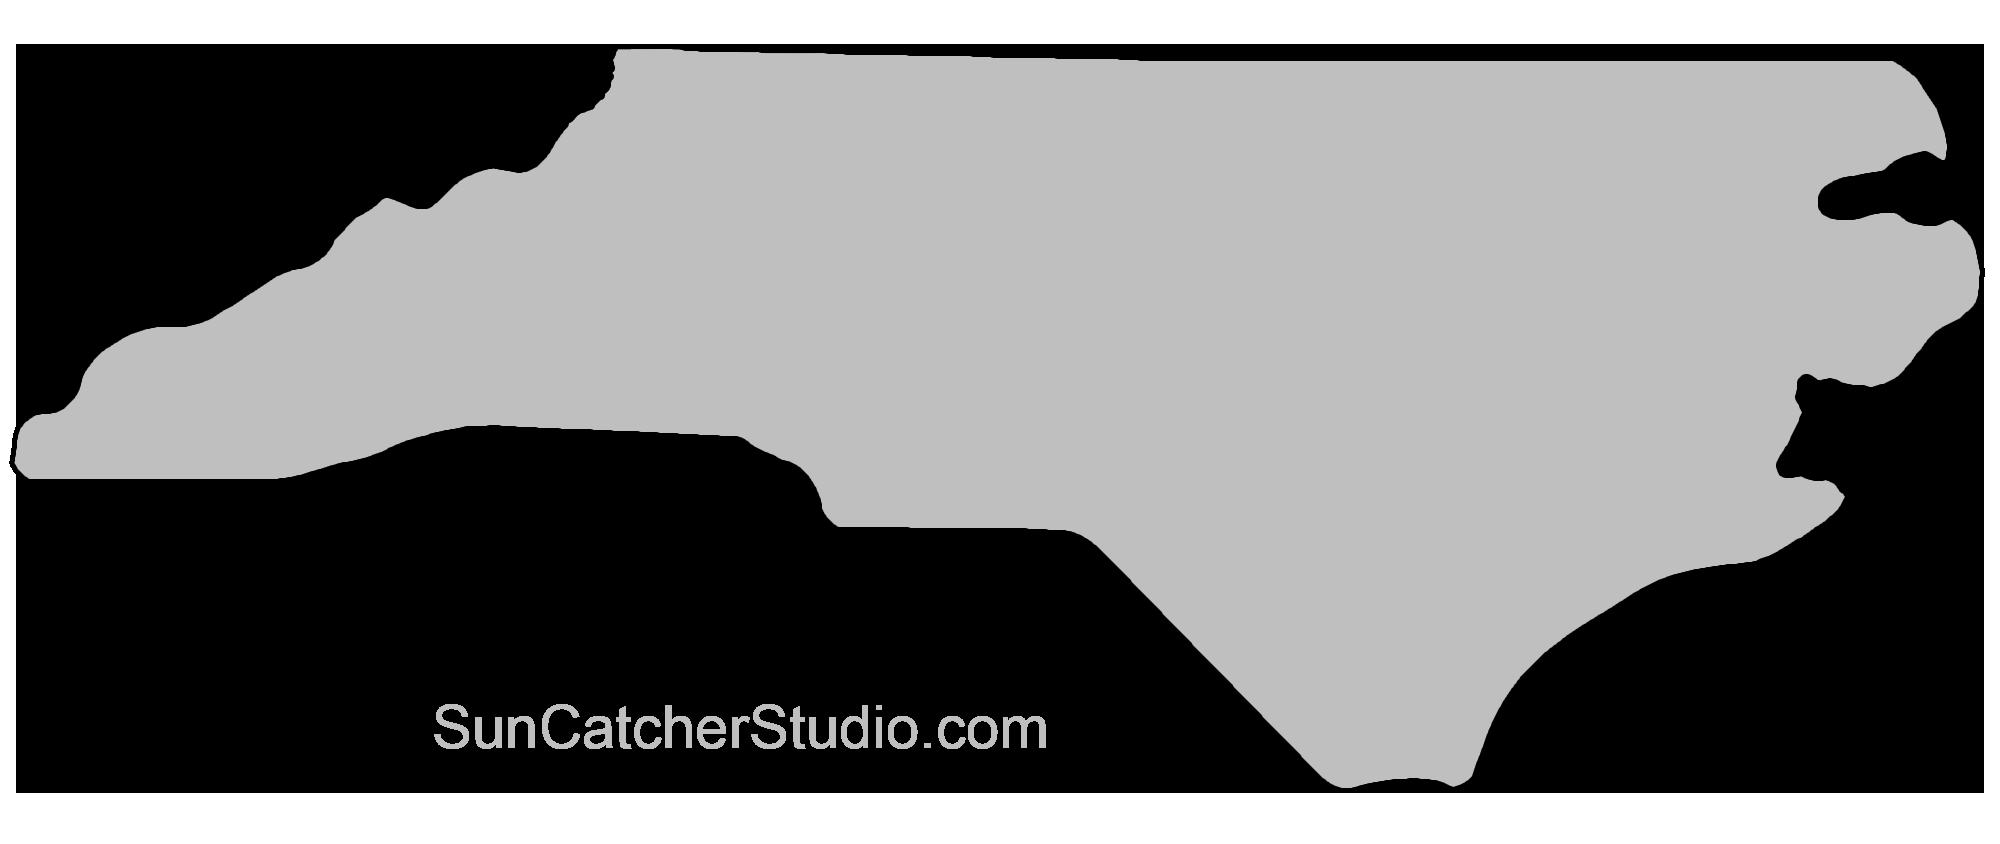 State Outlines Maps Stencils Patterns Clip Art All 50 States North Carolina Map North Carolina Outline North Carolina Stencil